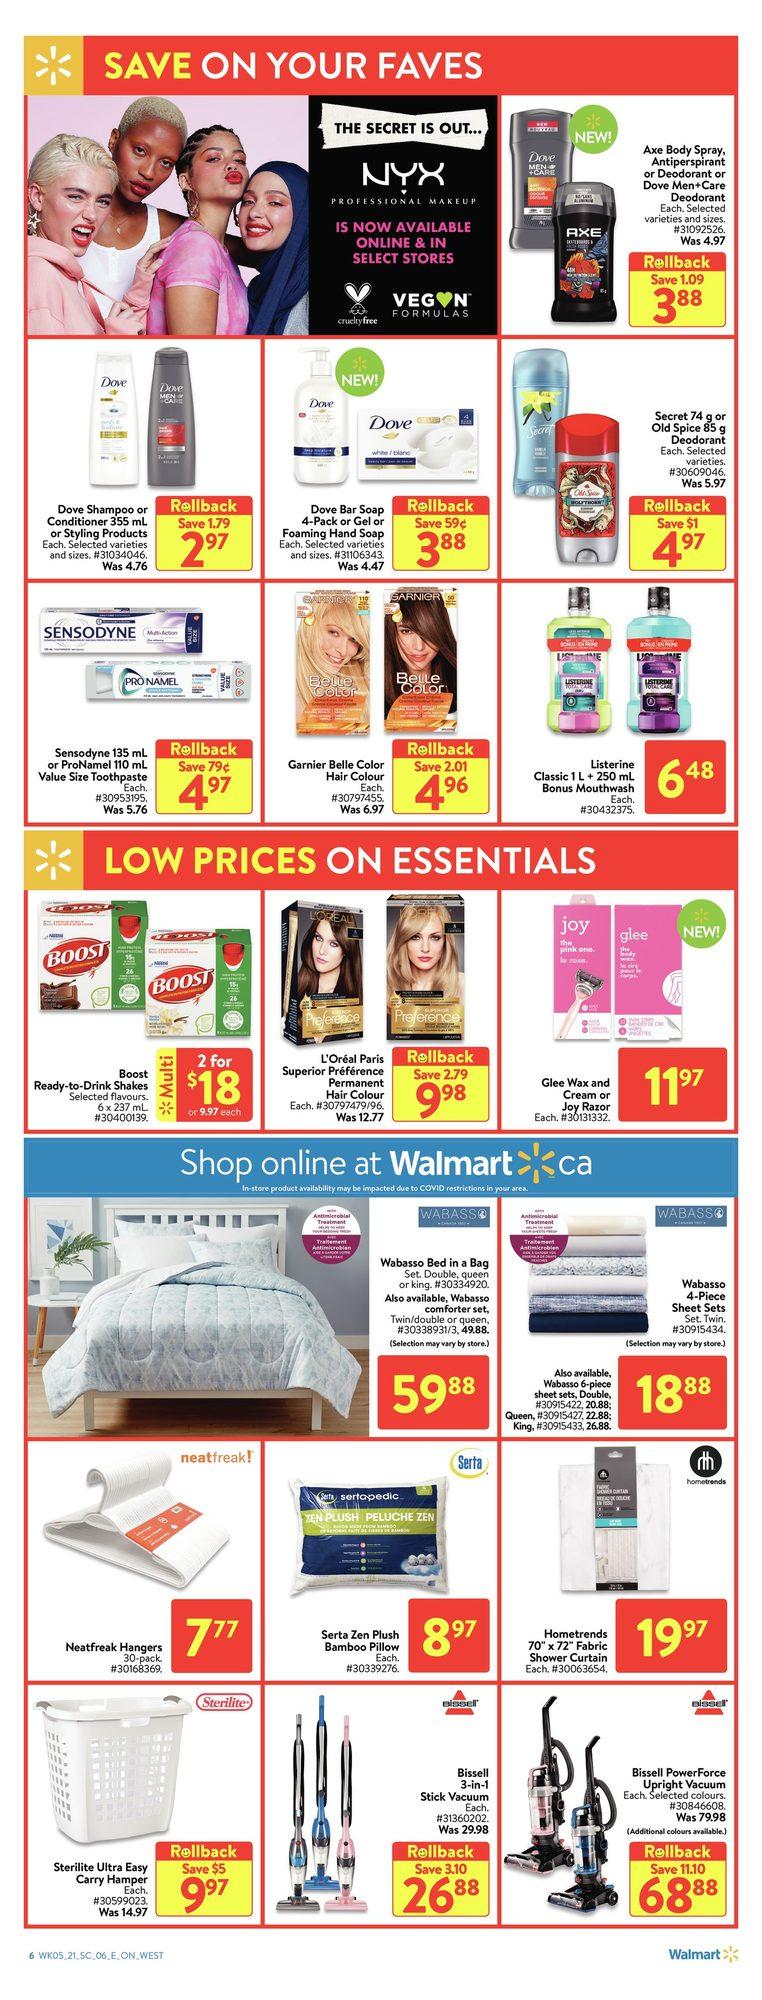 Walmart - Weekly Flyer Specials - Page 11